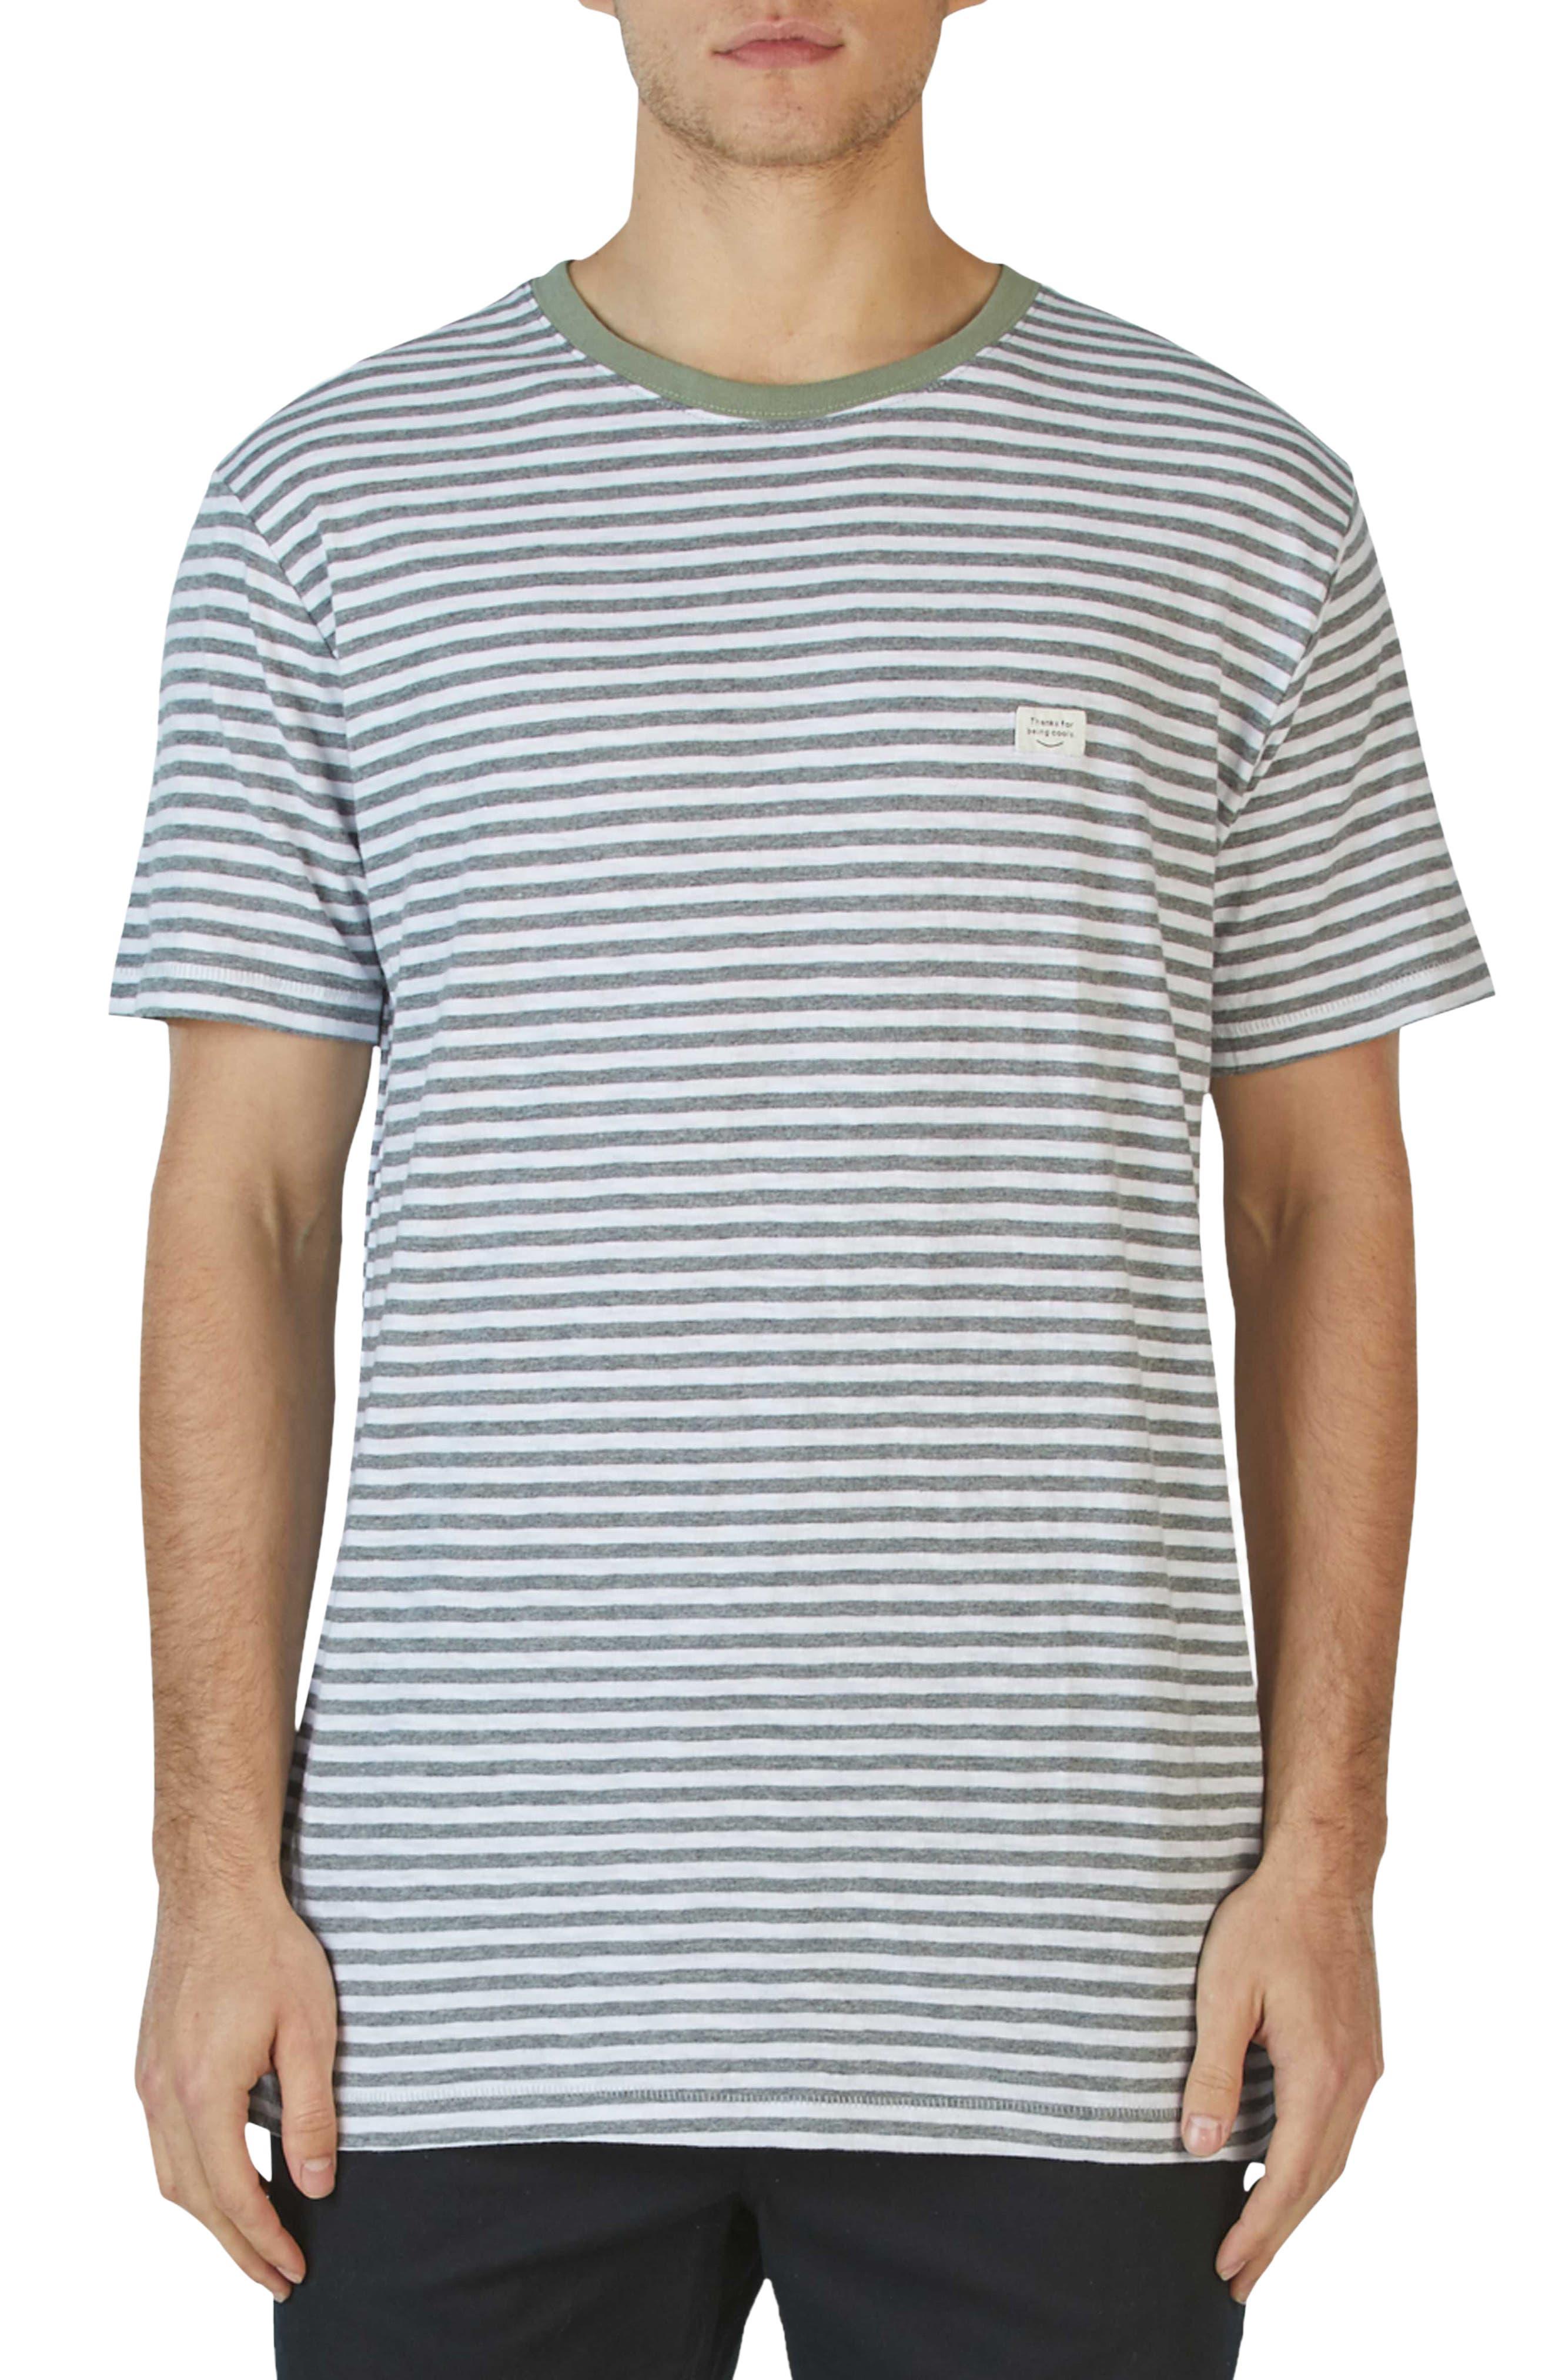 Barney Cools B. Thankful Striped T-Shirt